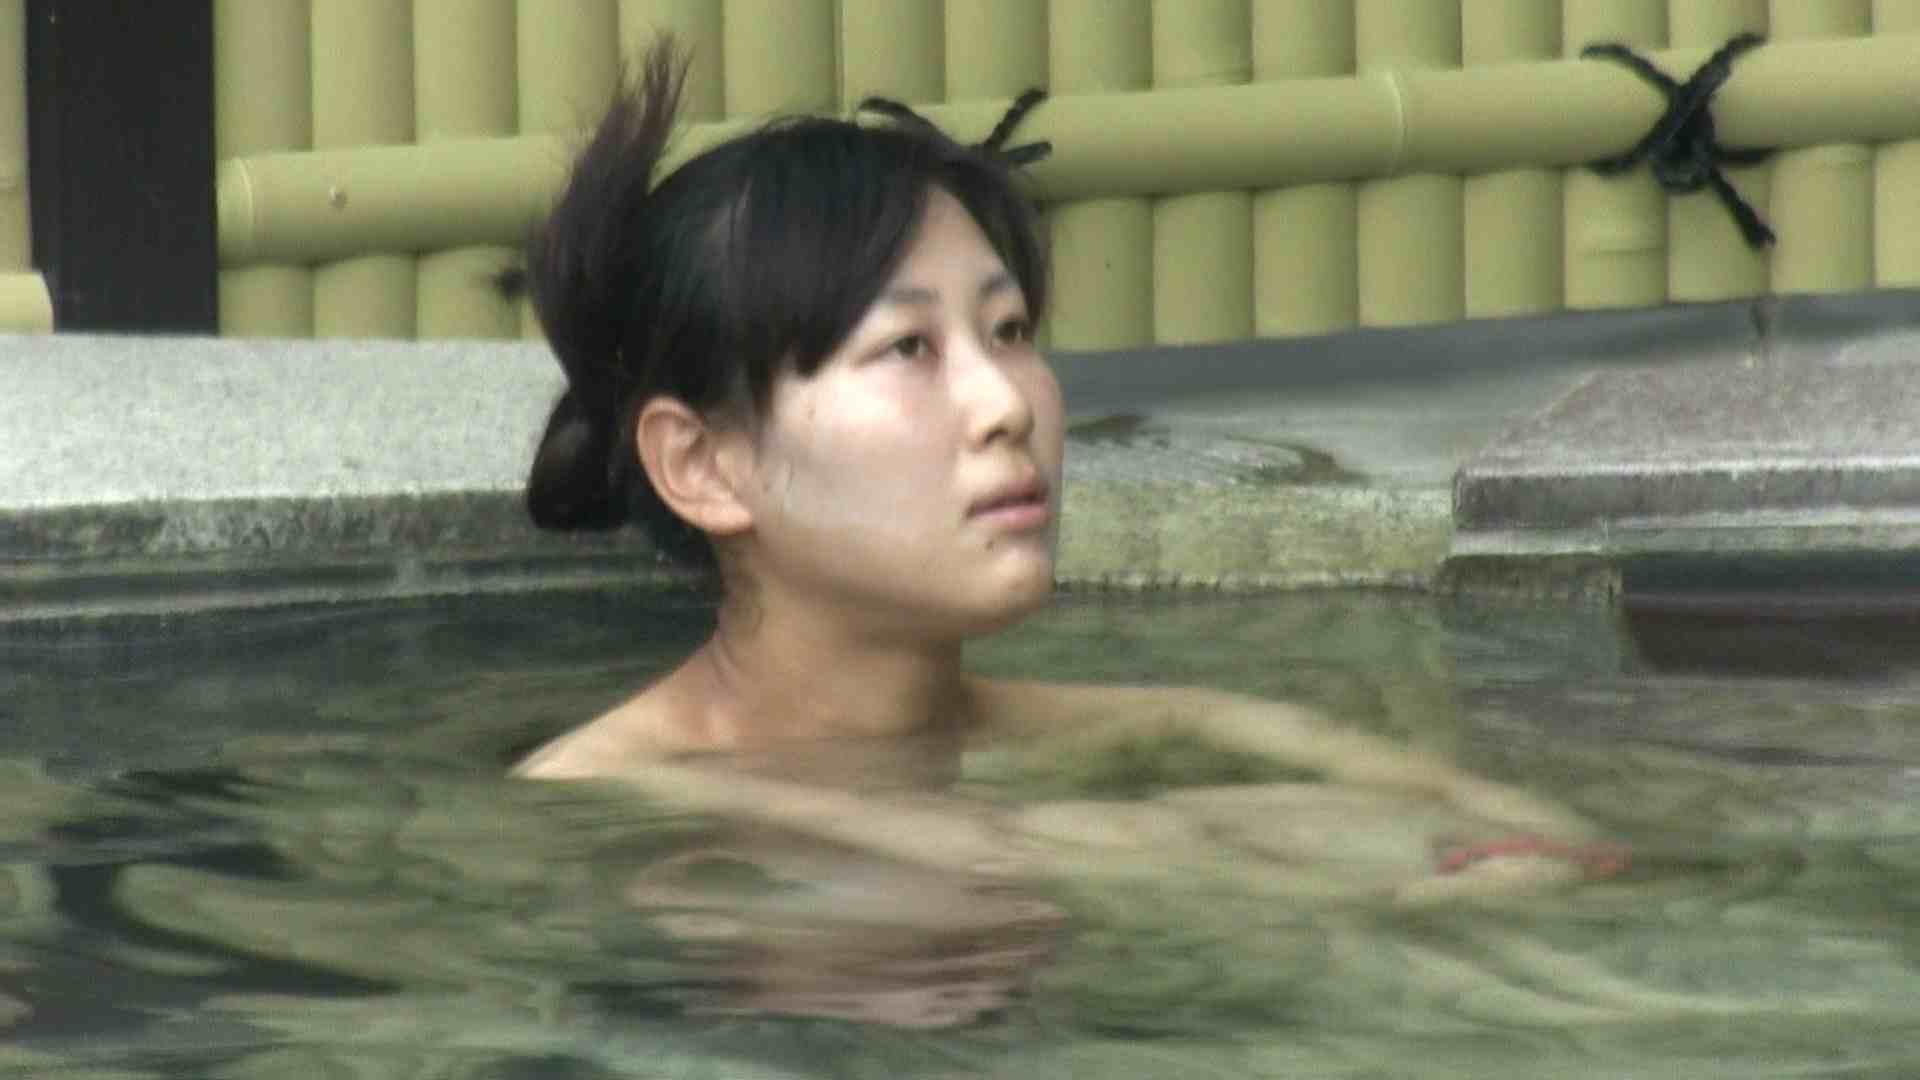 Aquaな露天風呂Vol.665 露天 アダルト動画キャプチャ 85枚 26